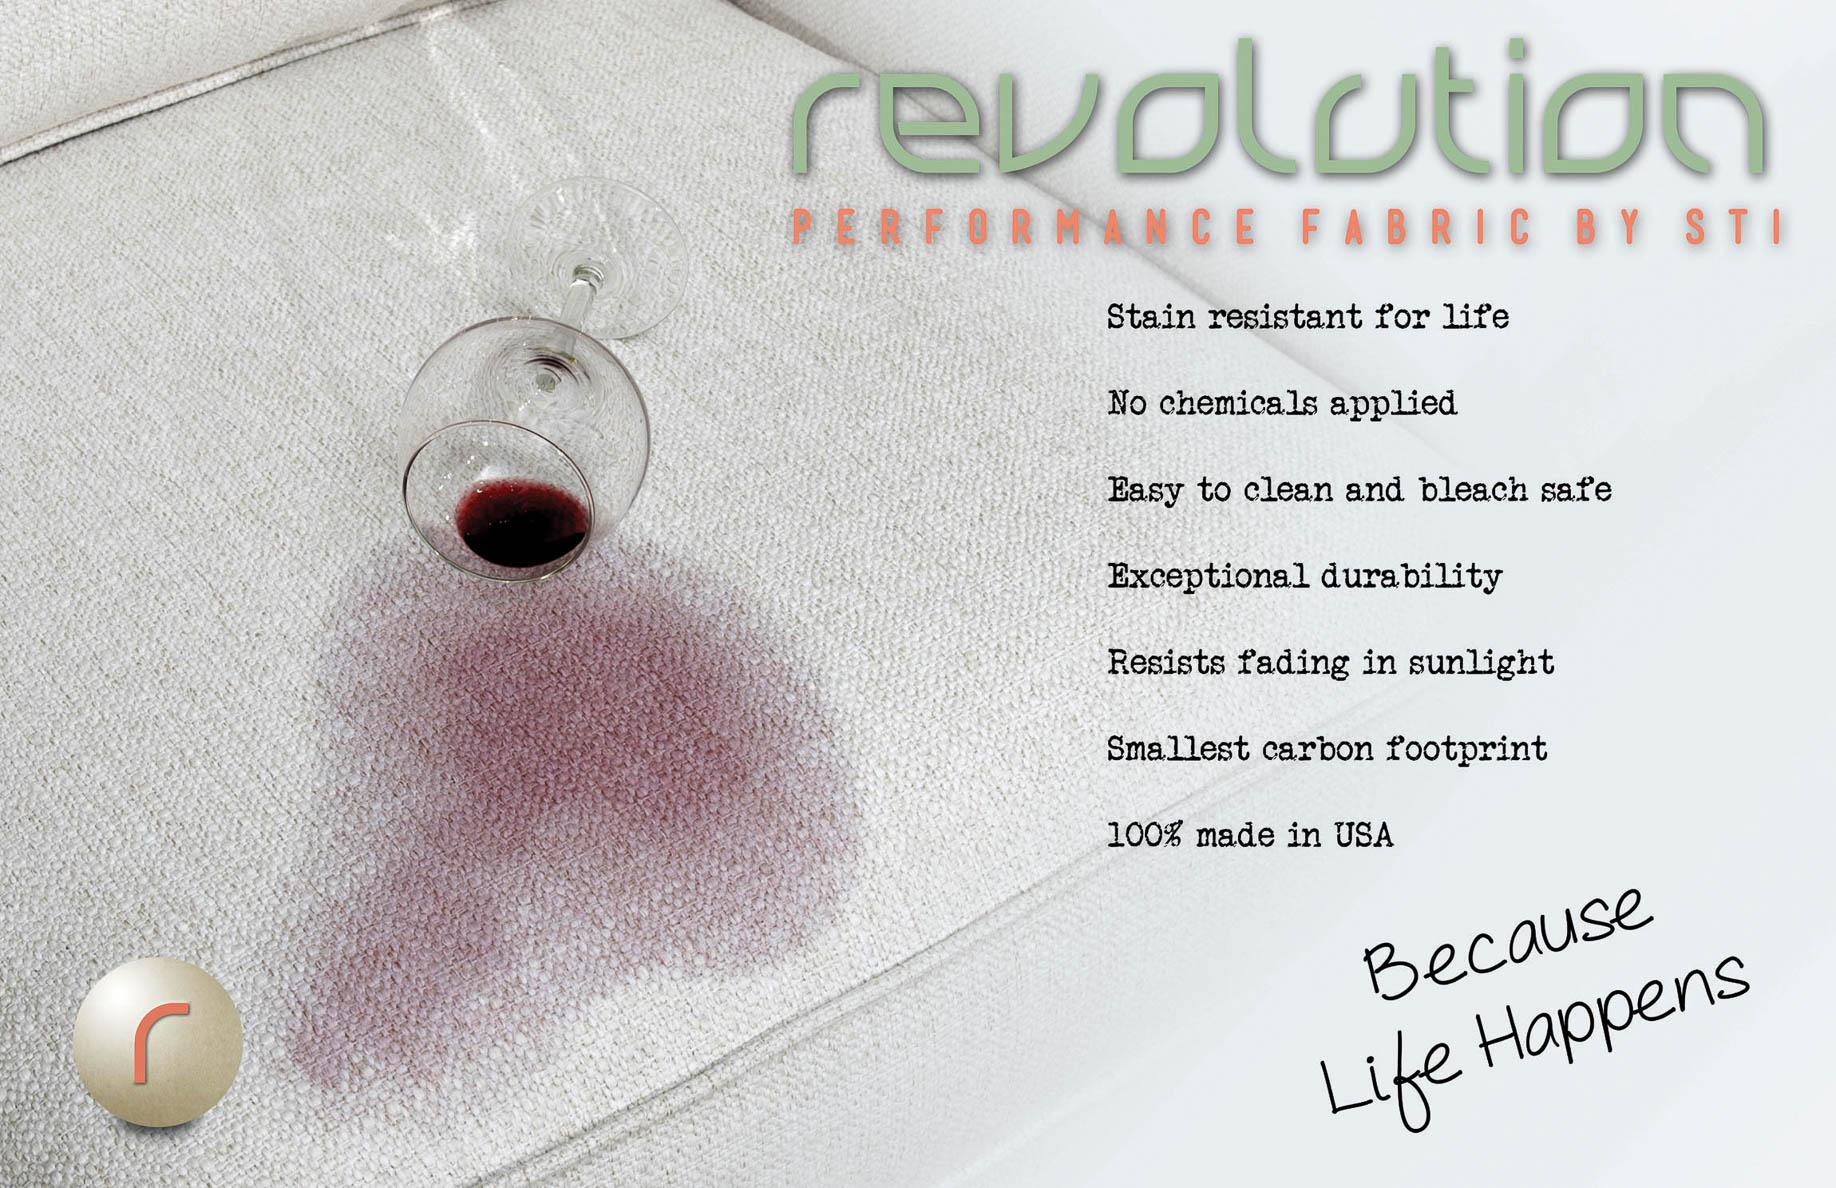 Revolution Fabrics by STI